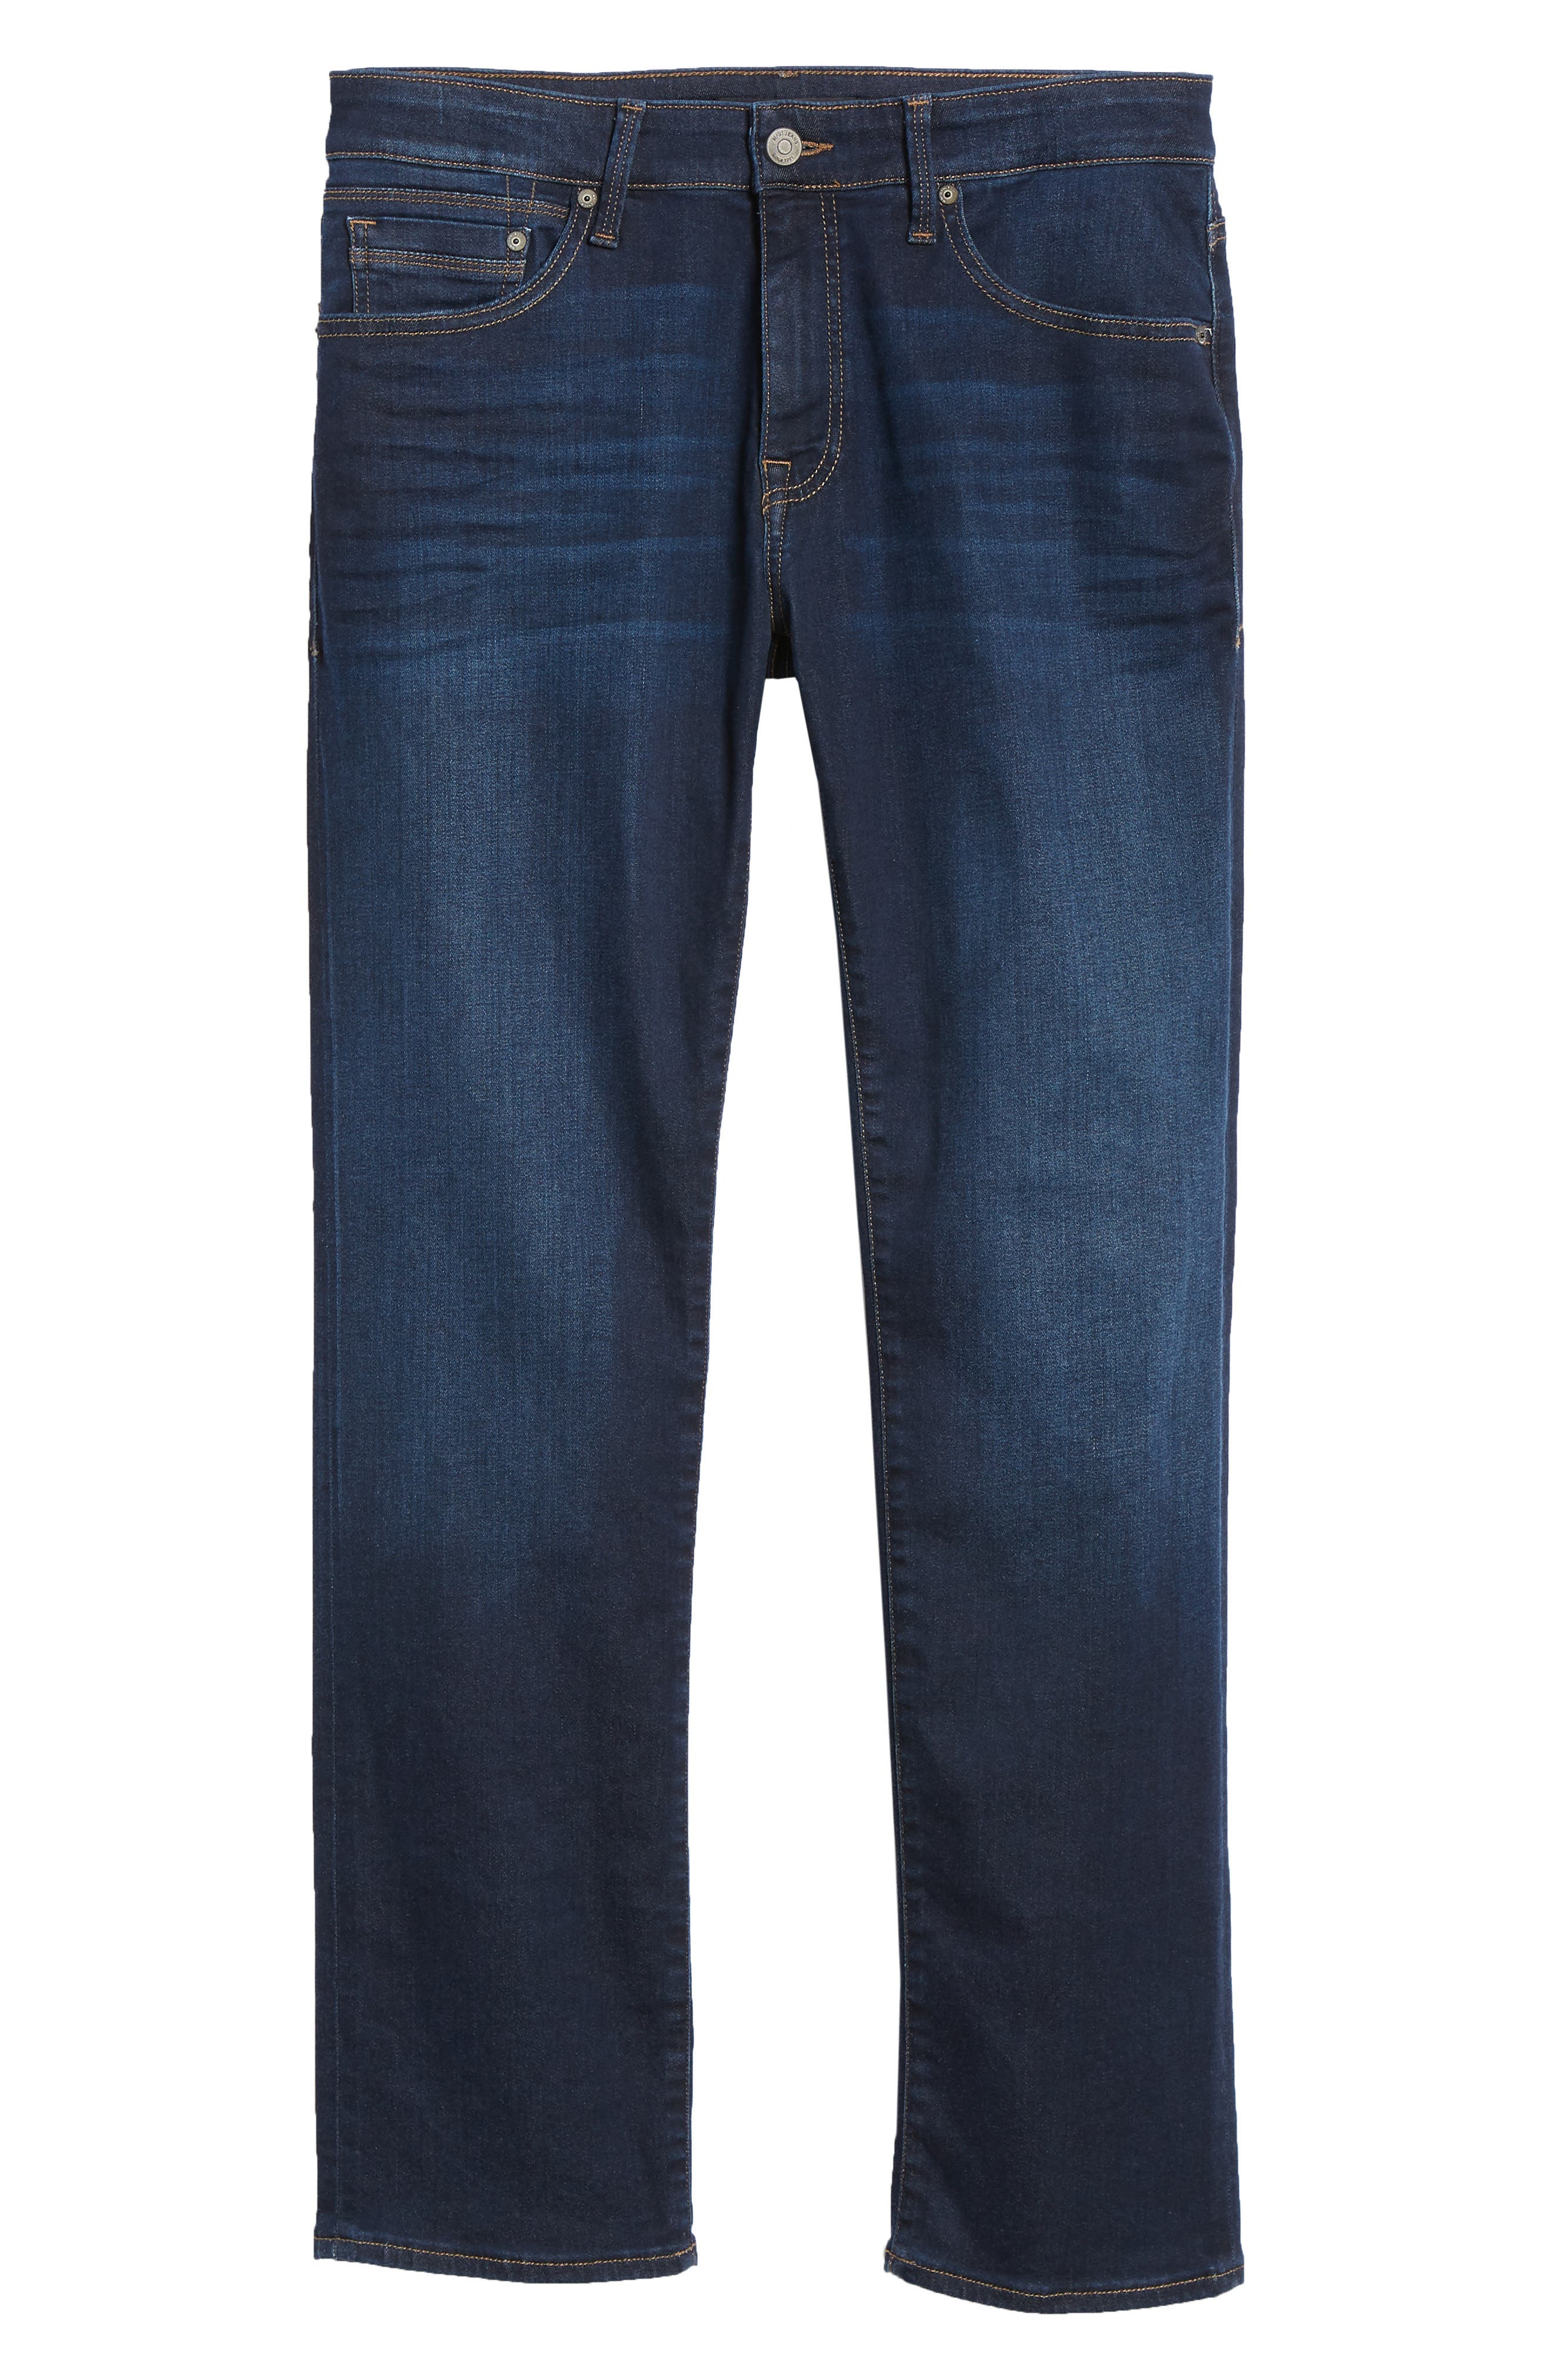 Zach Straight Leg Jeans,                             Alternate thumbnail 6, color,                             DEEP SOFT MOVE